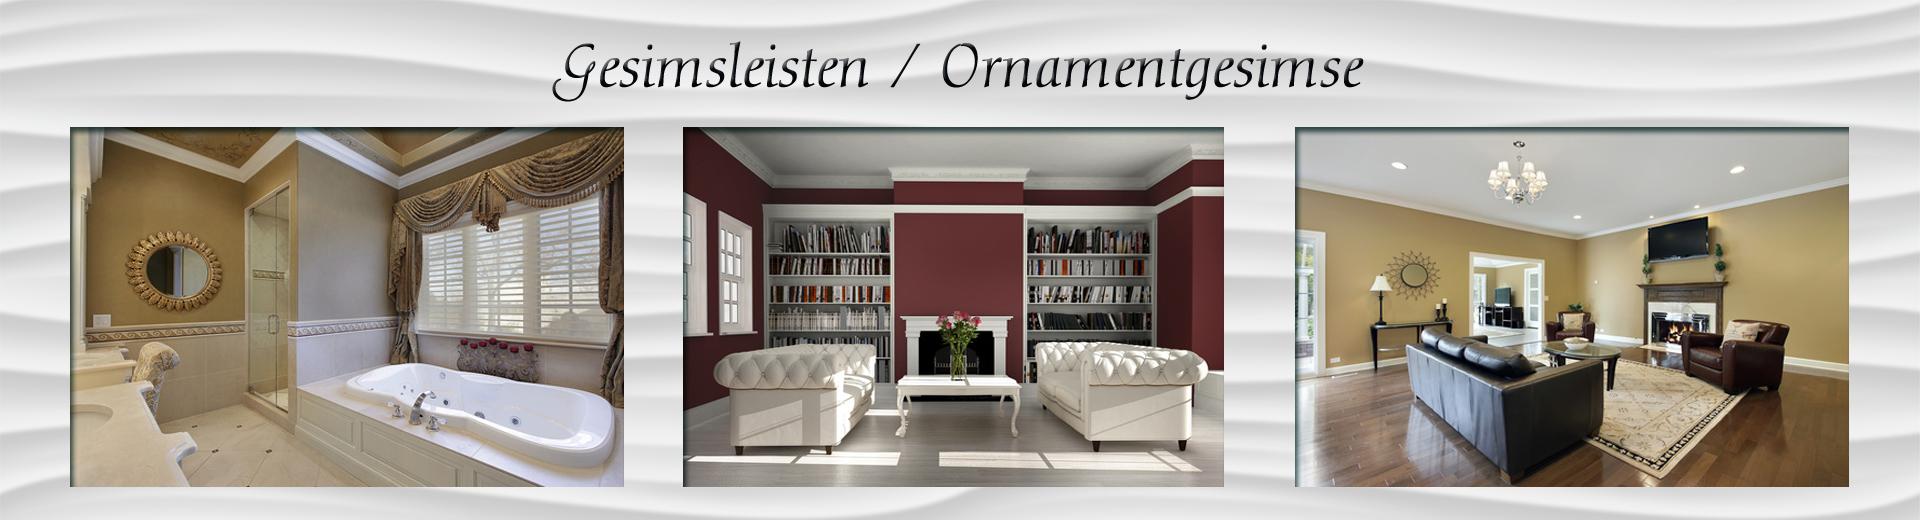 Gesimsleisten / Ornamentgesimse